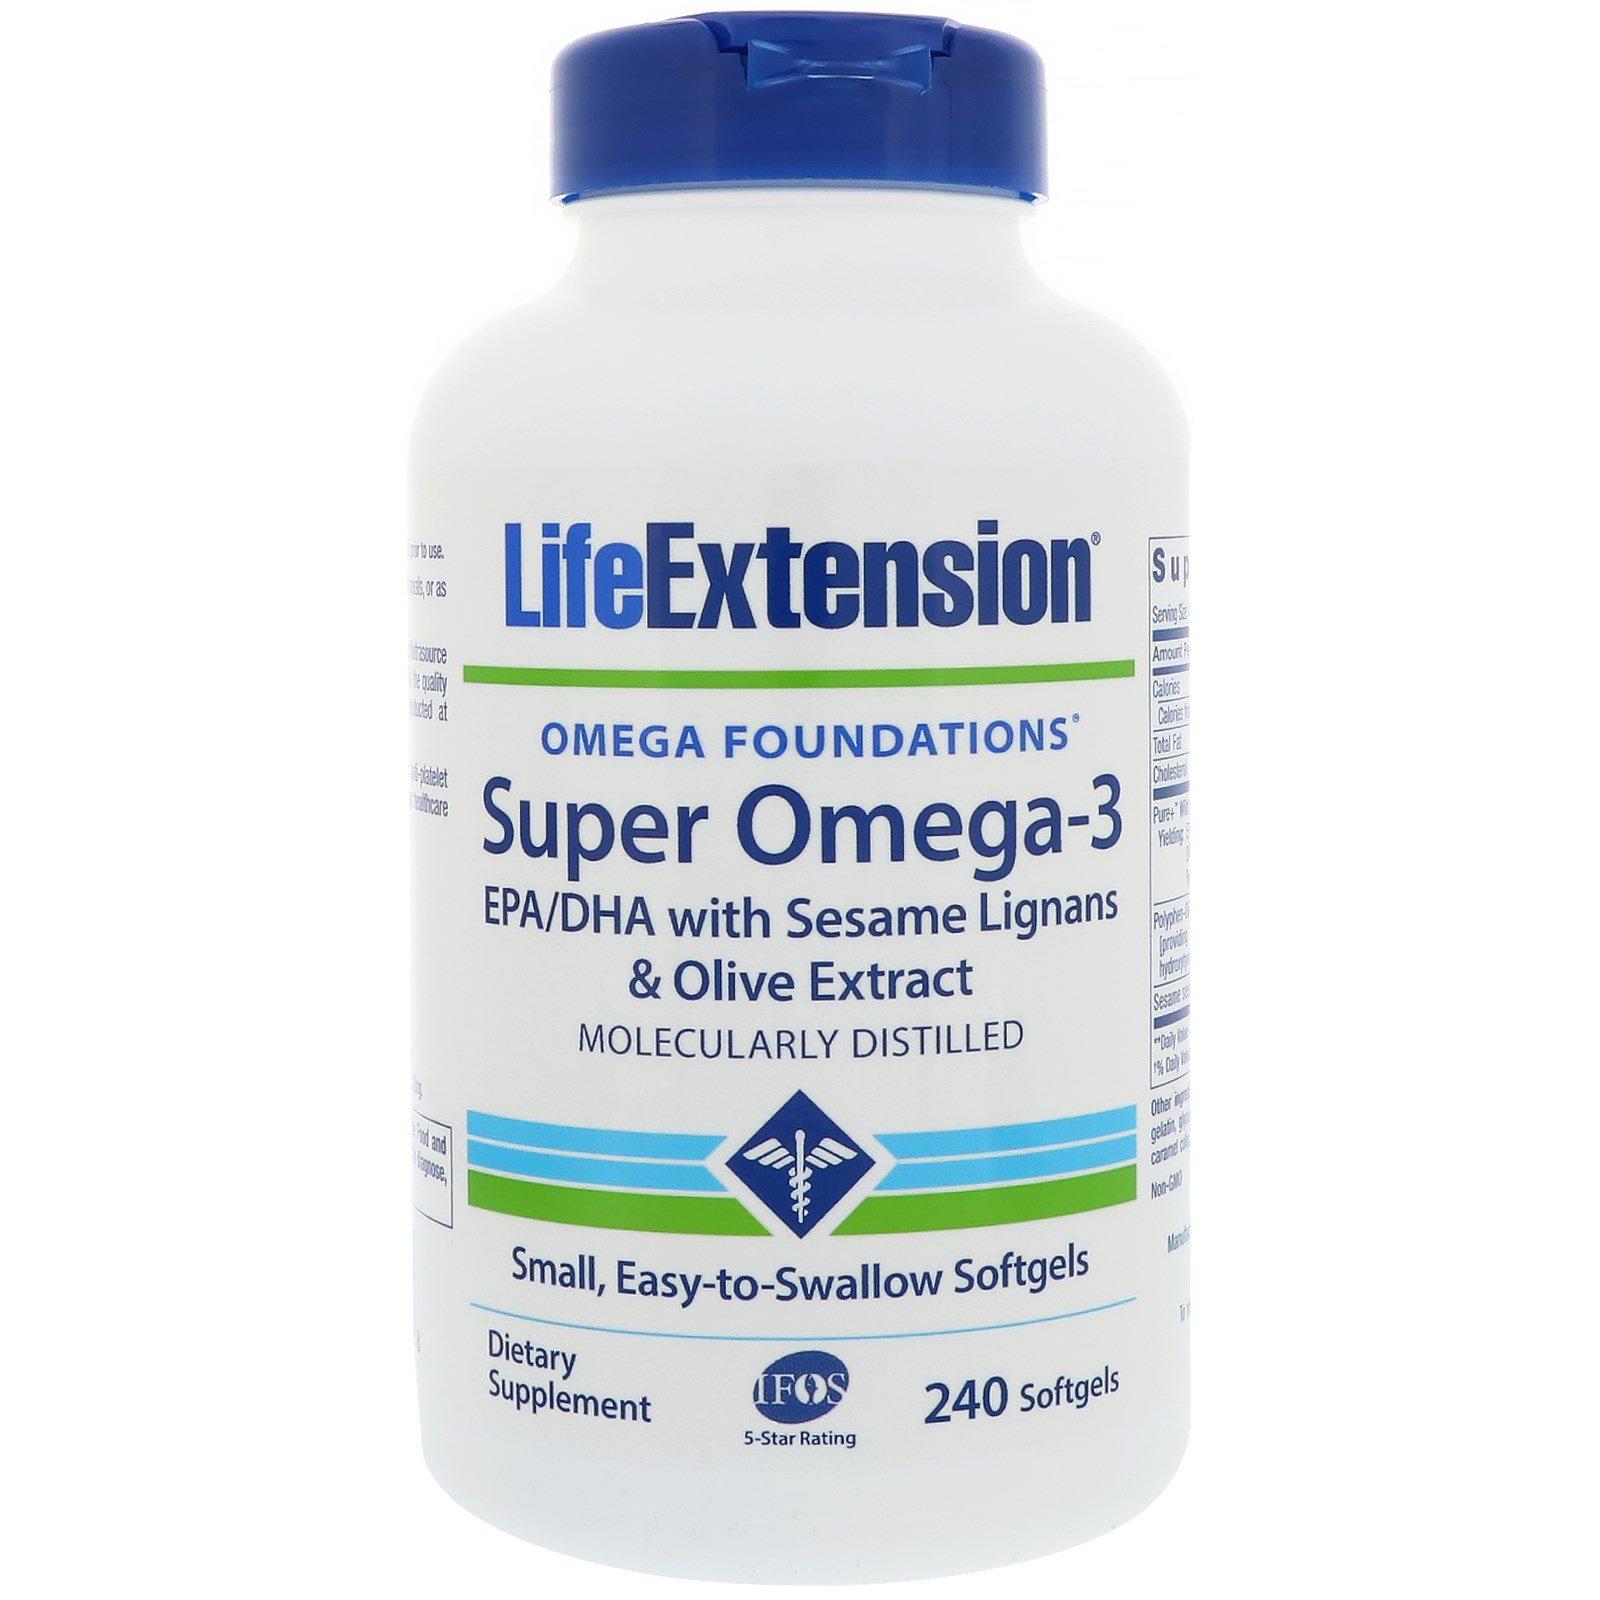 Omega 3 super pill reviews